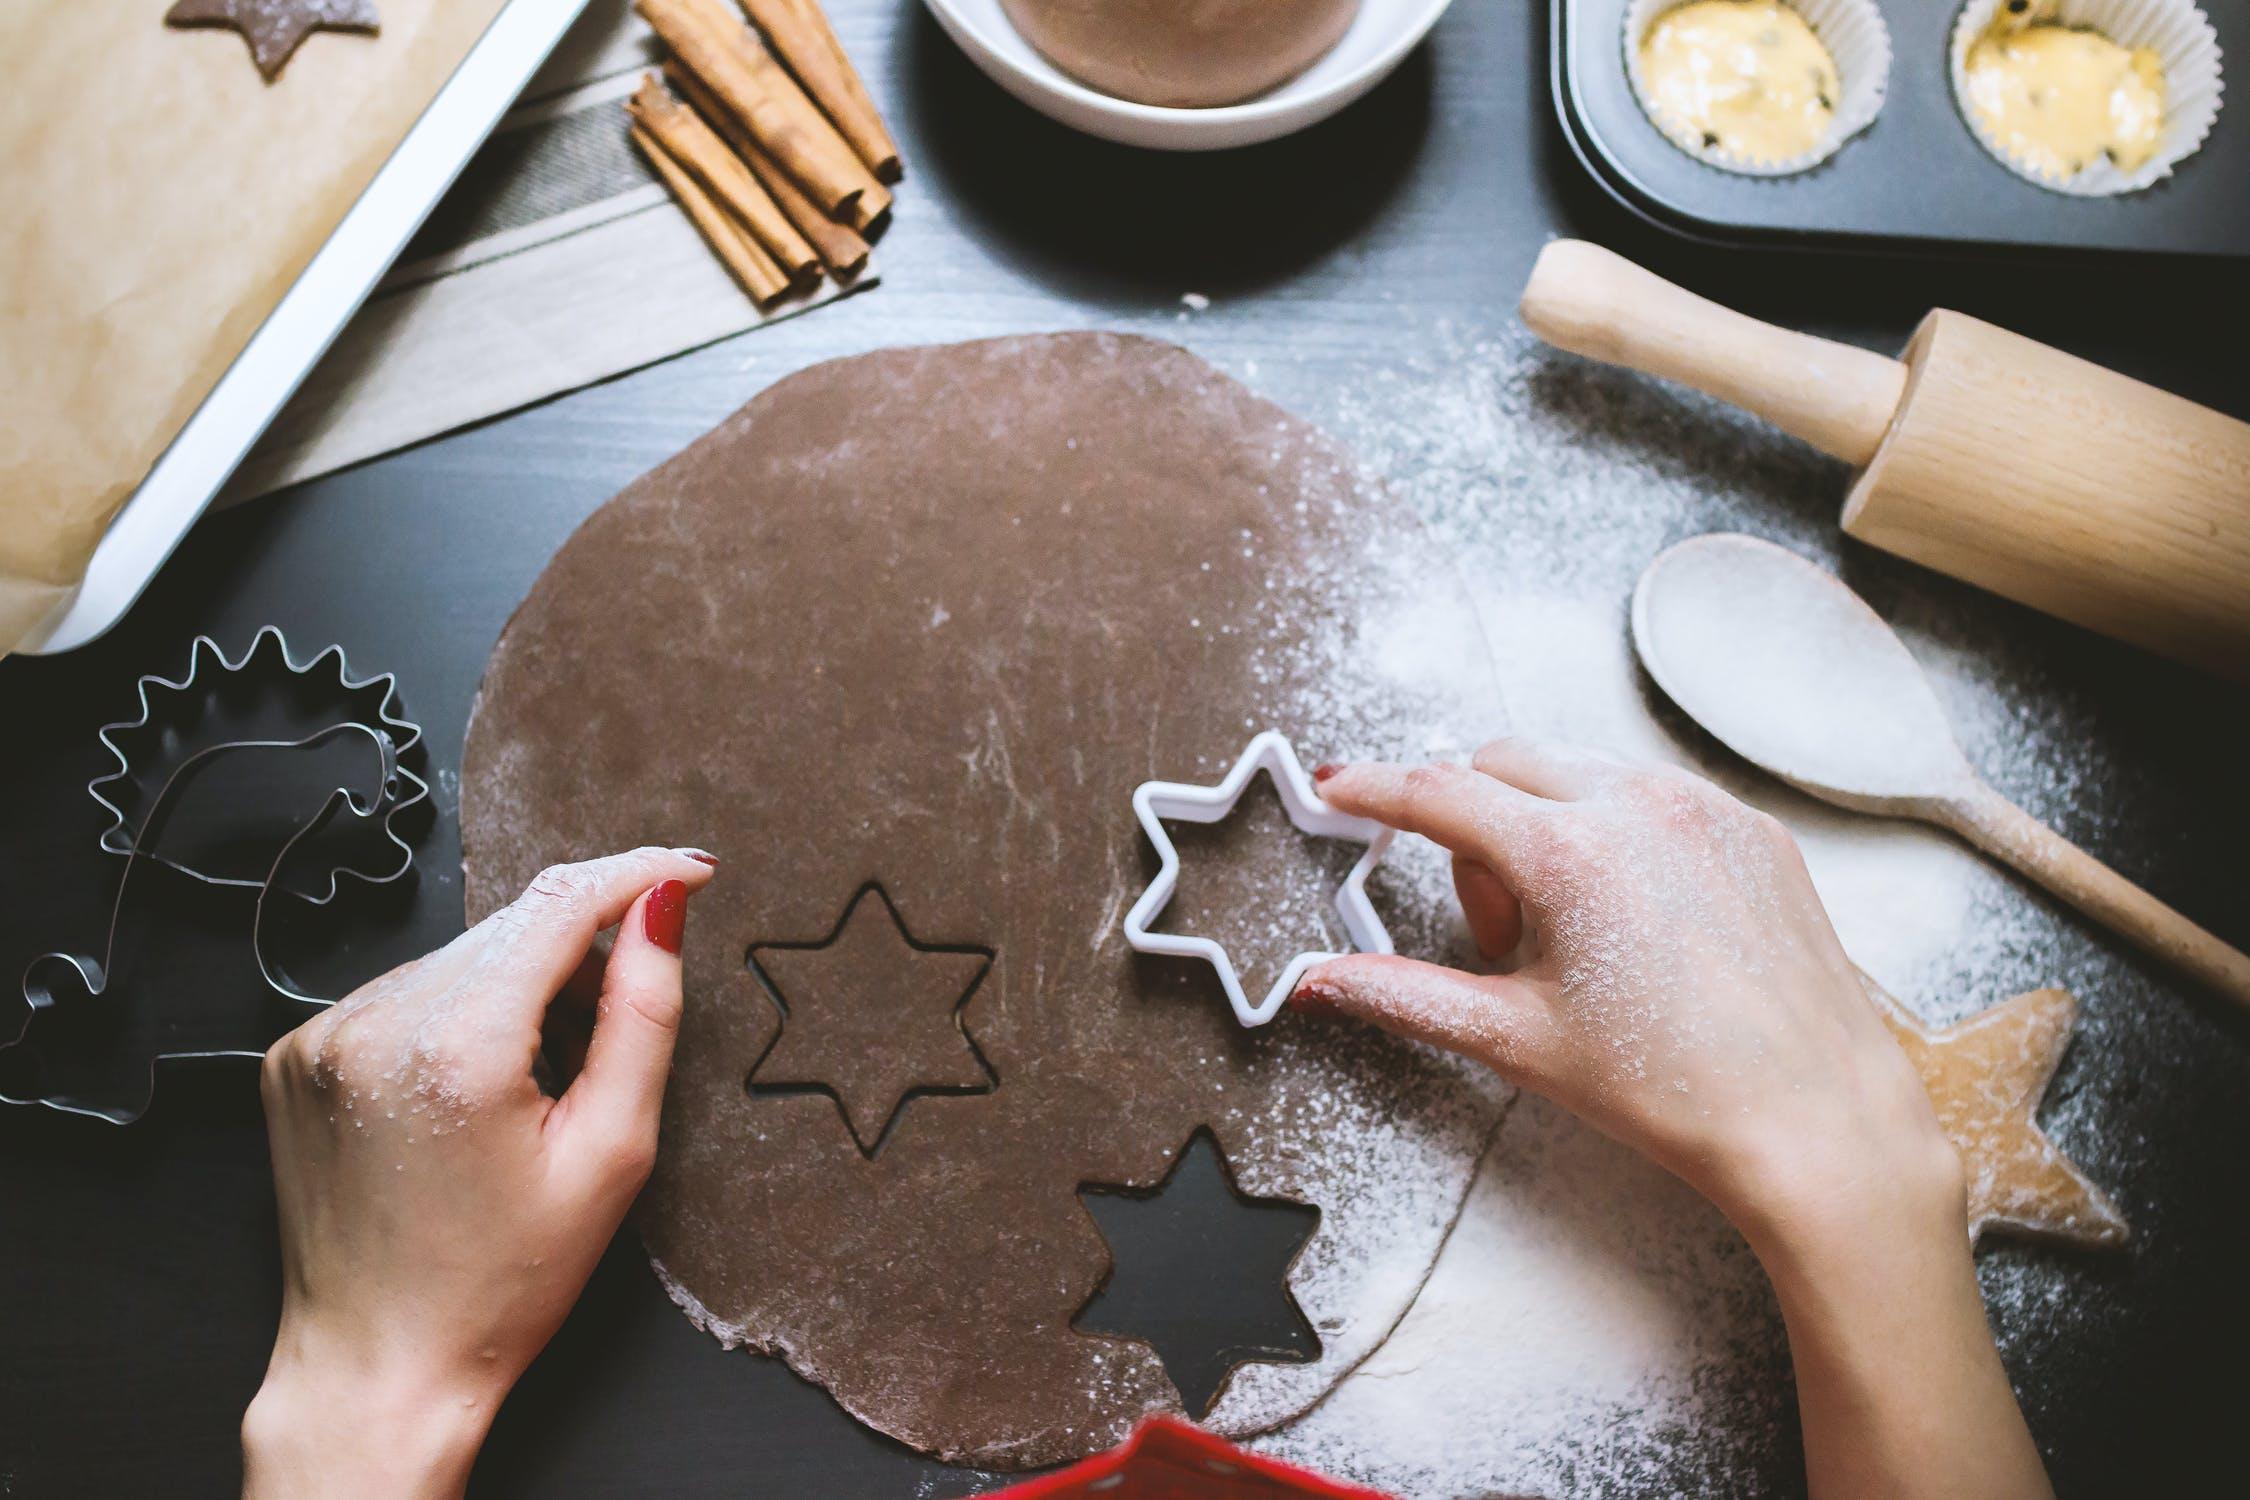 baking hobby